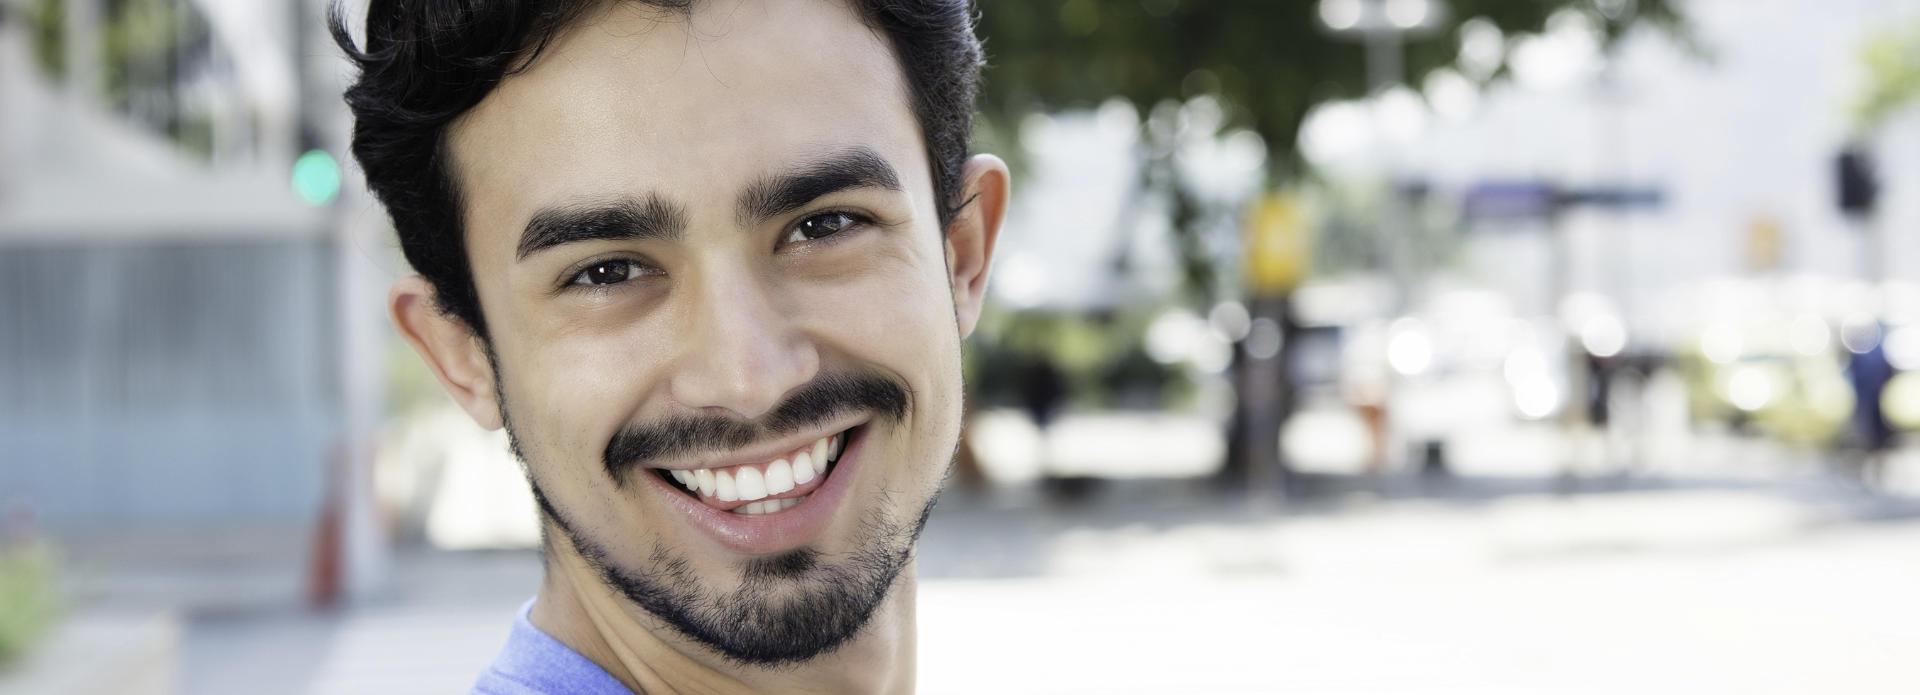 cheerful, smiling man